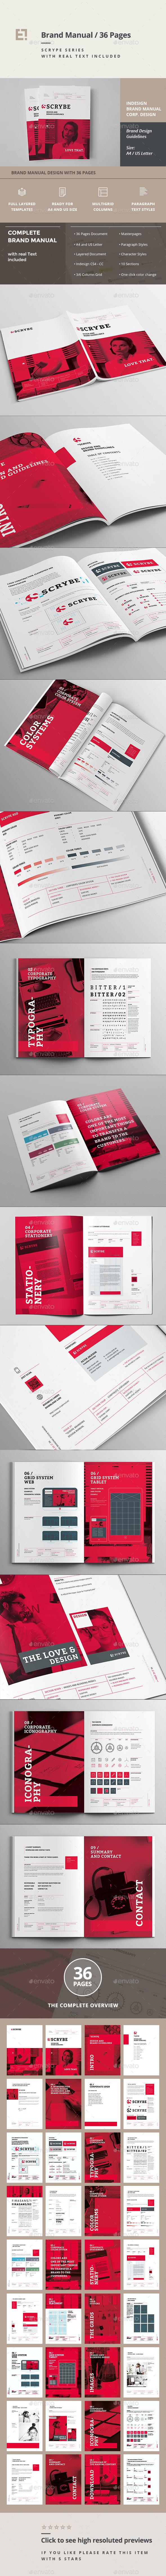 GraphicRiver Brand Manual 11883097